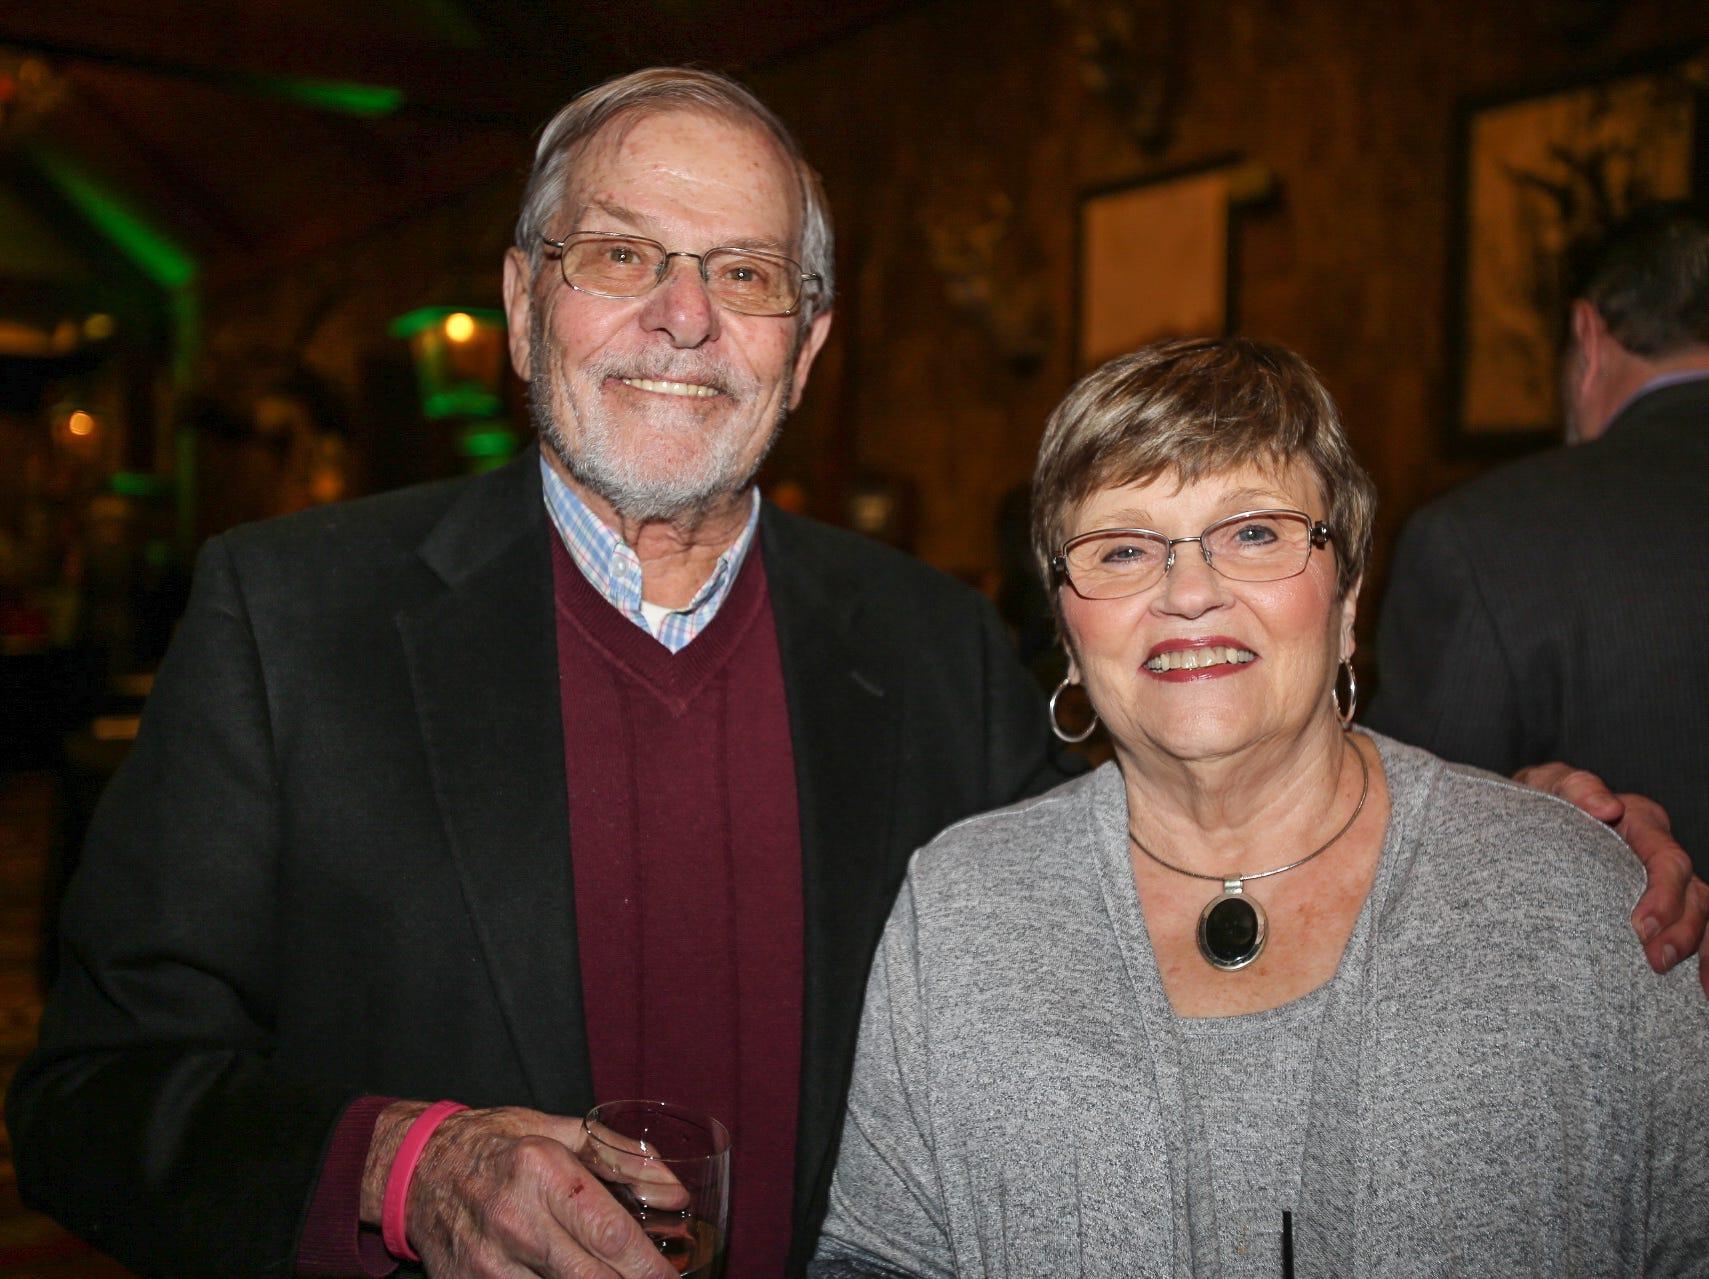 David and Linda Meyer